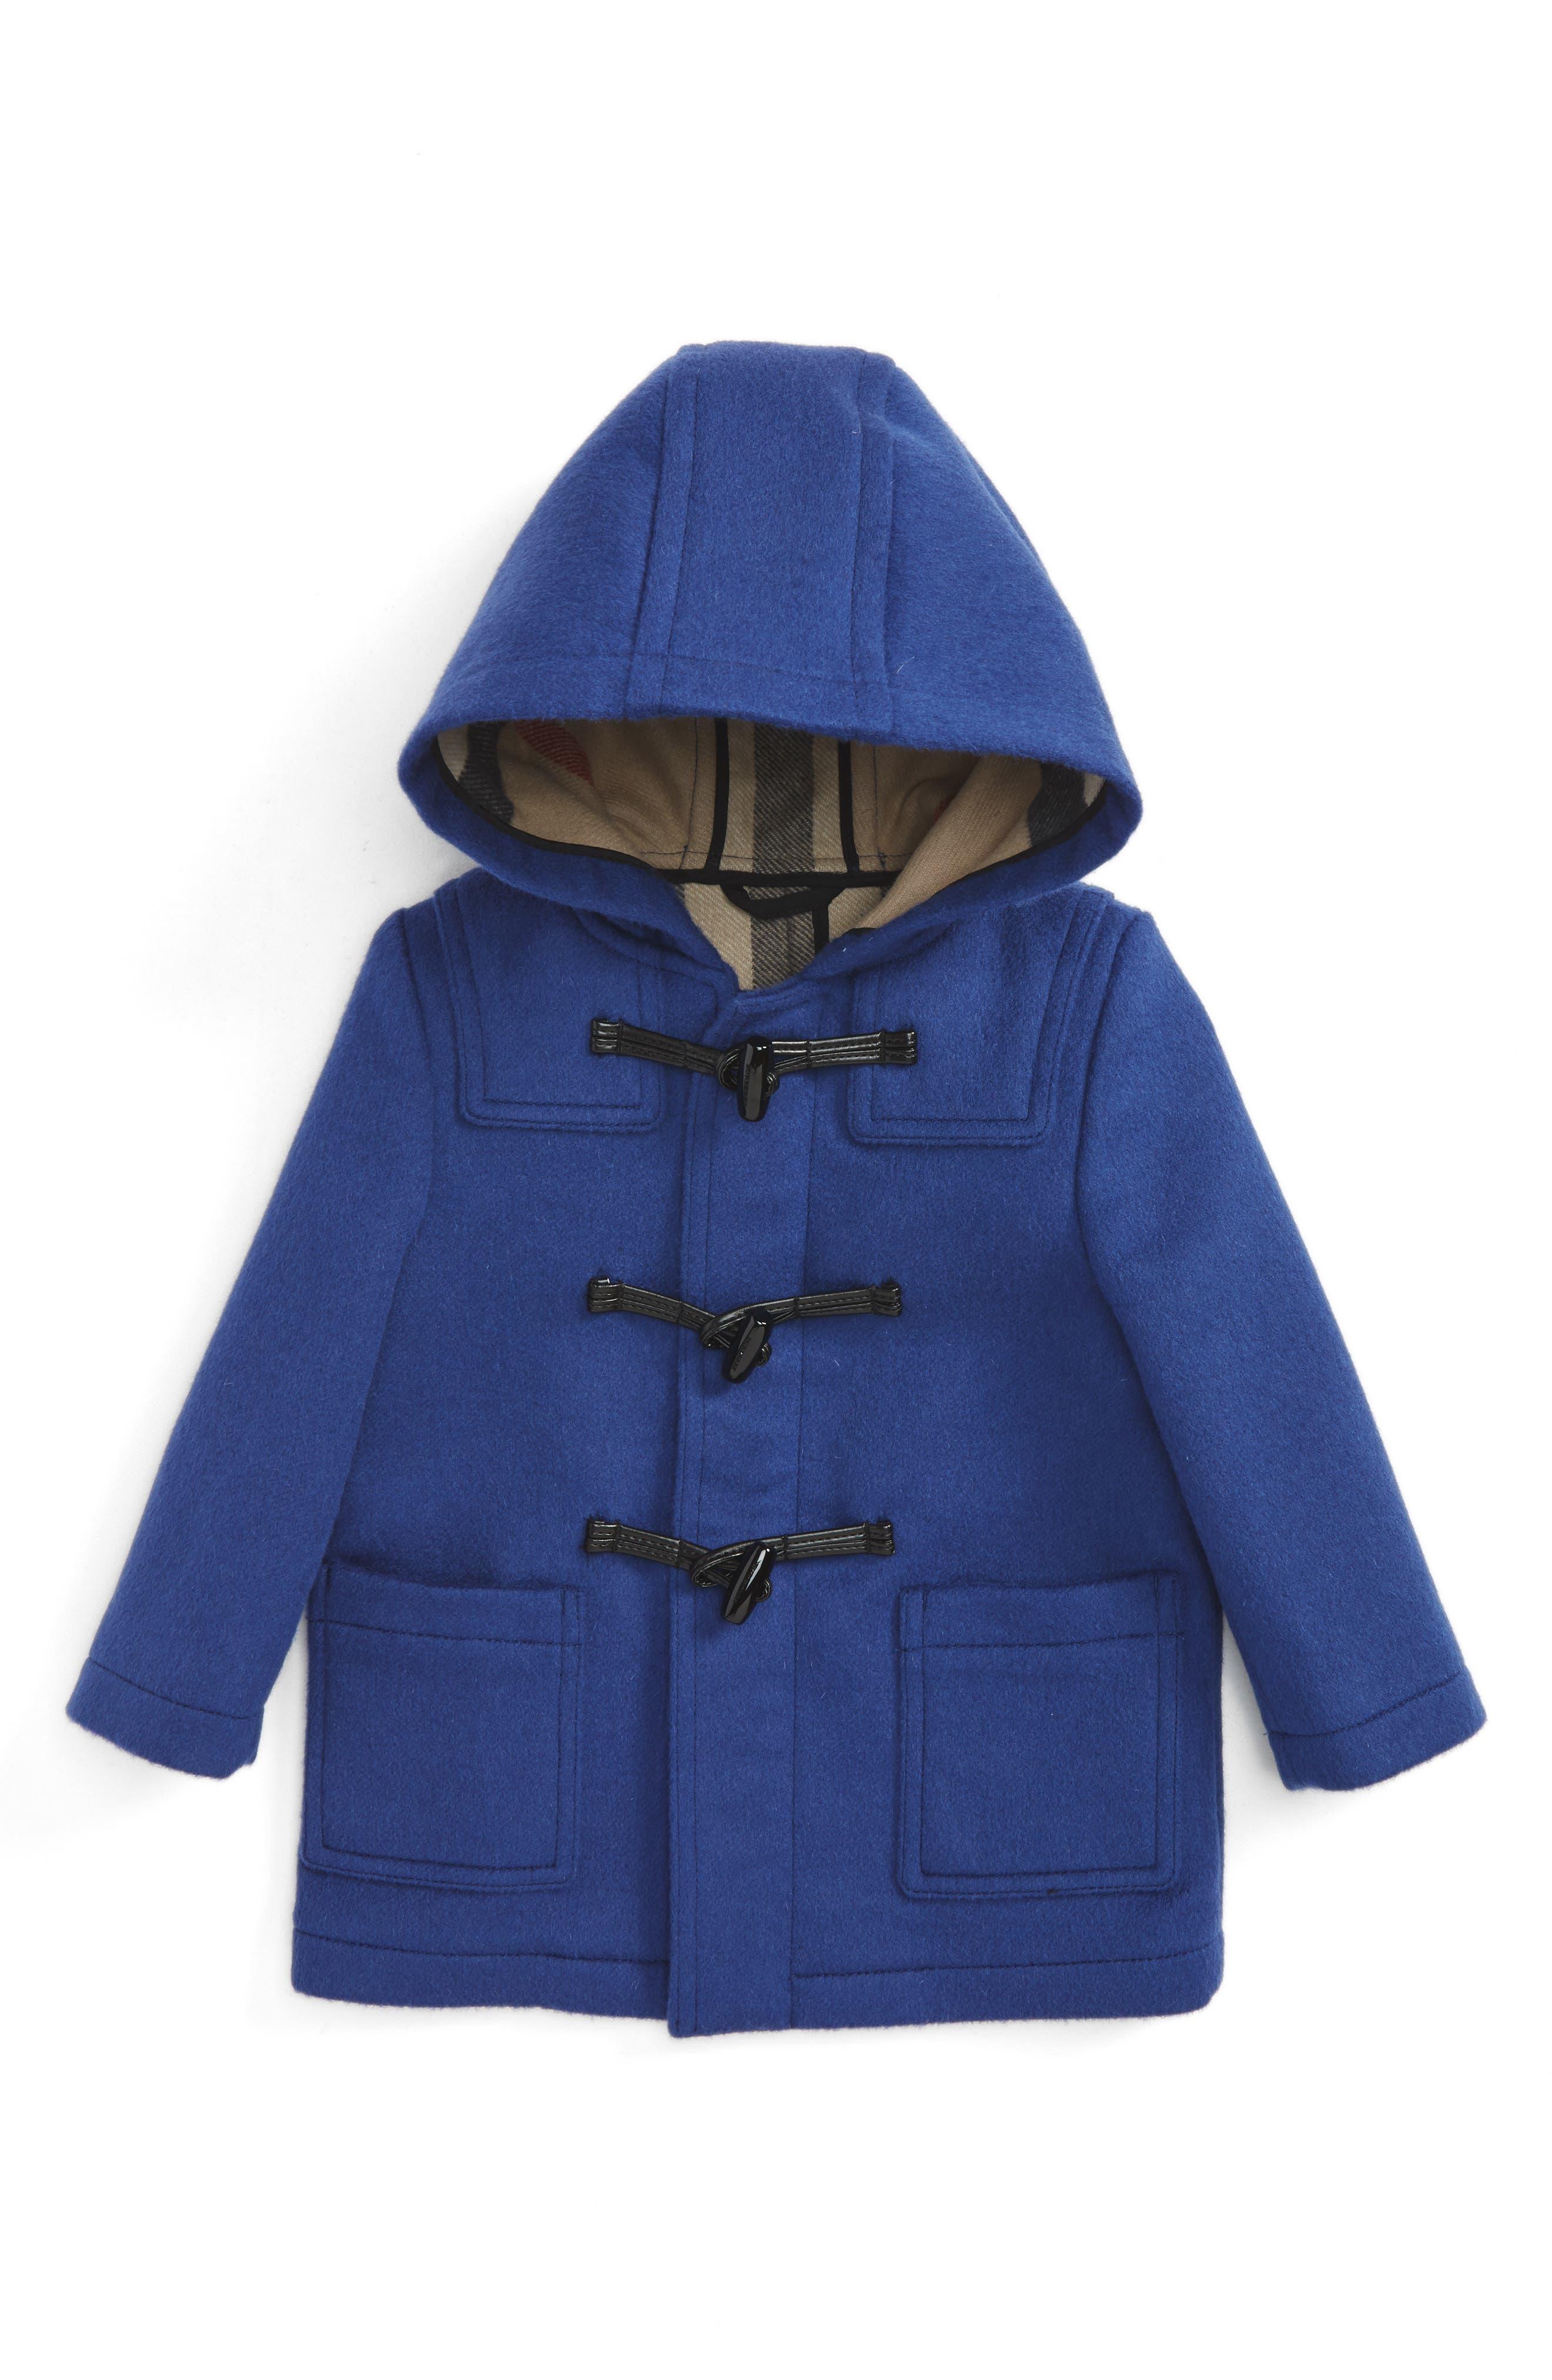 Main Image - Burberry Brogan Hooded Wool Toggle Coat (Baby Boys)